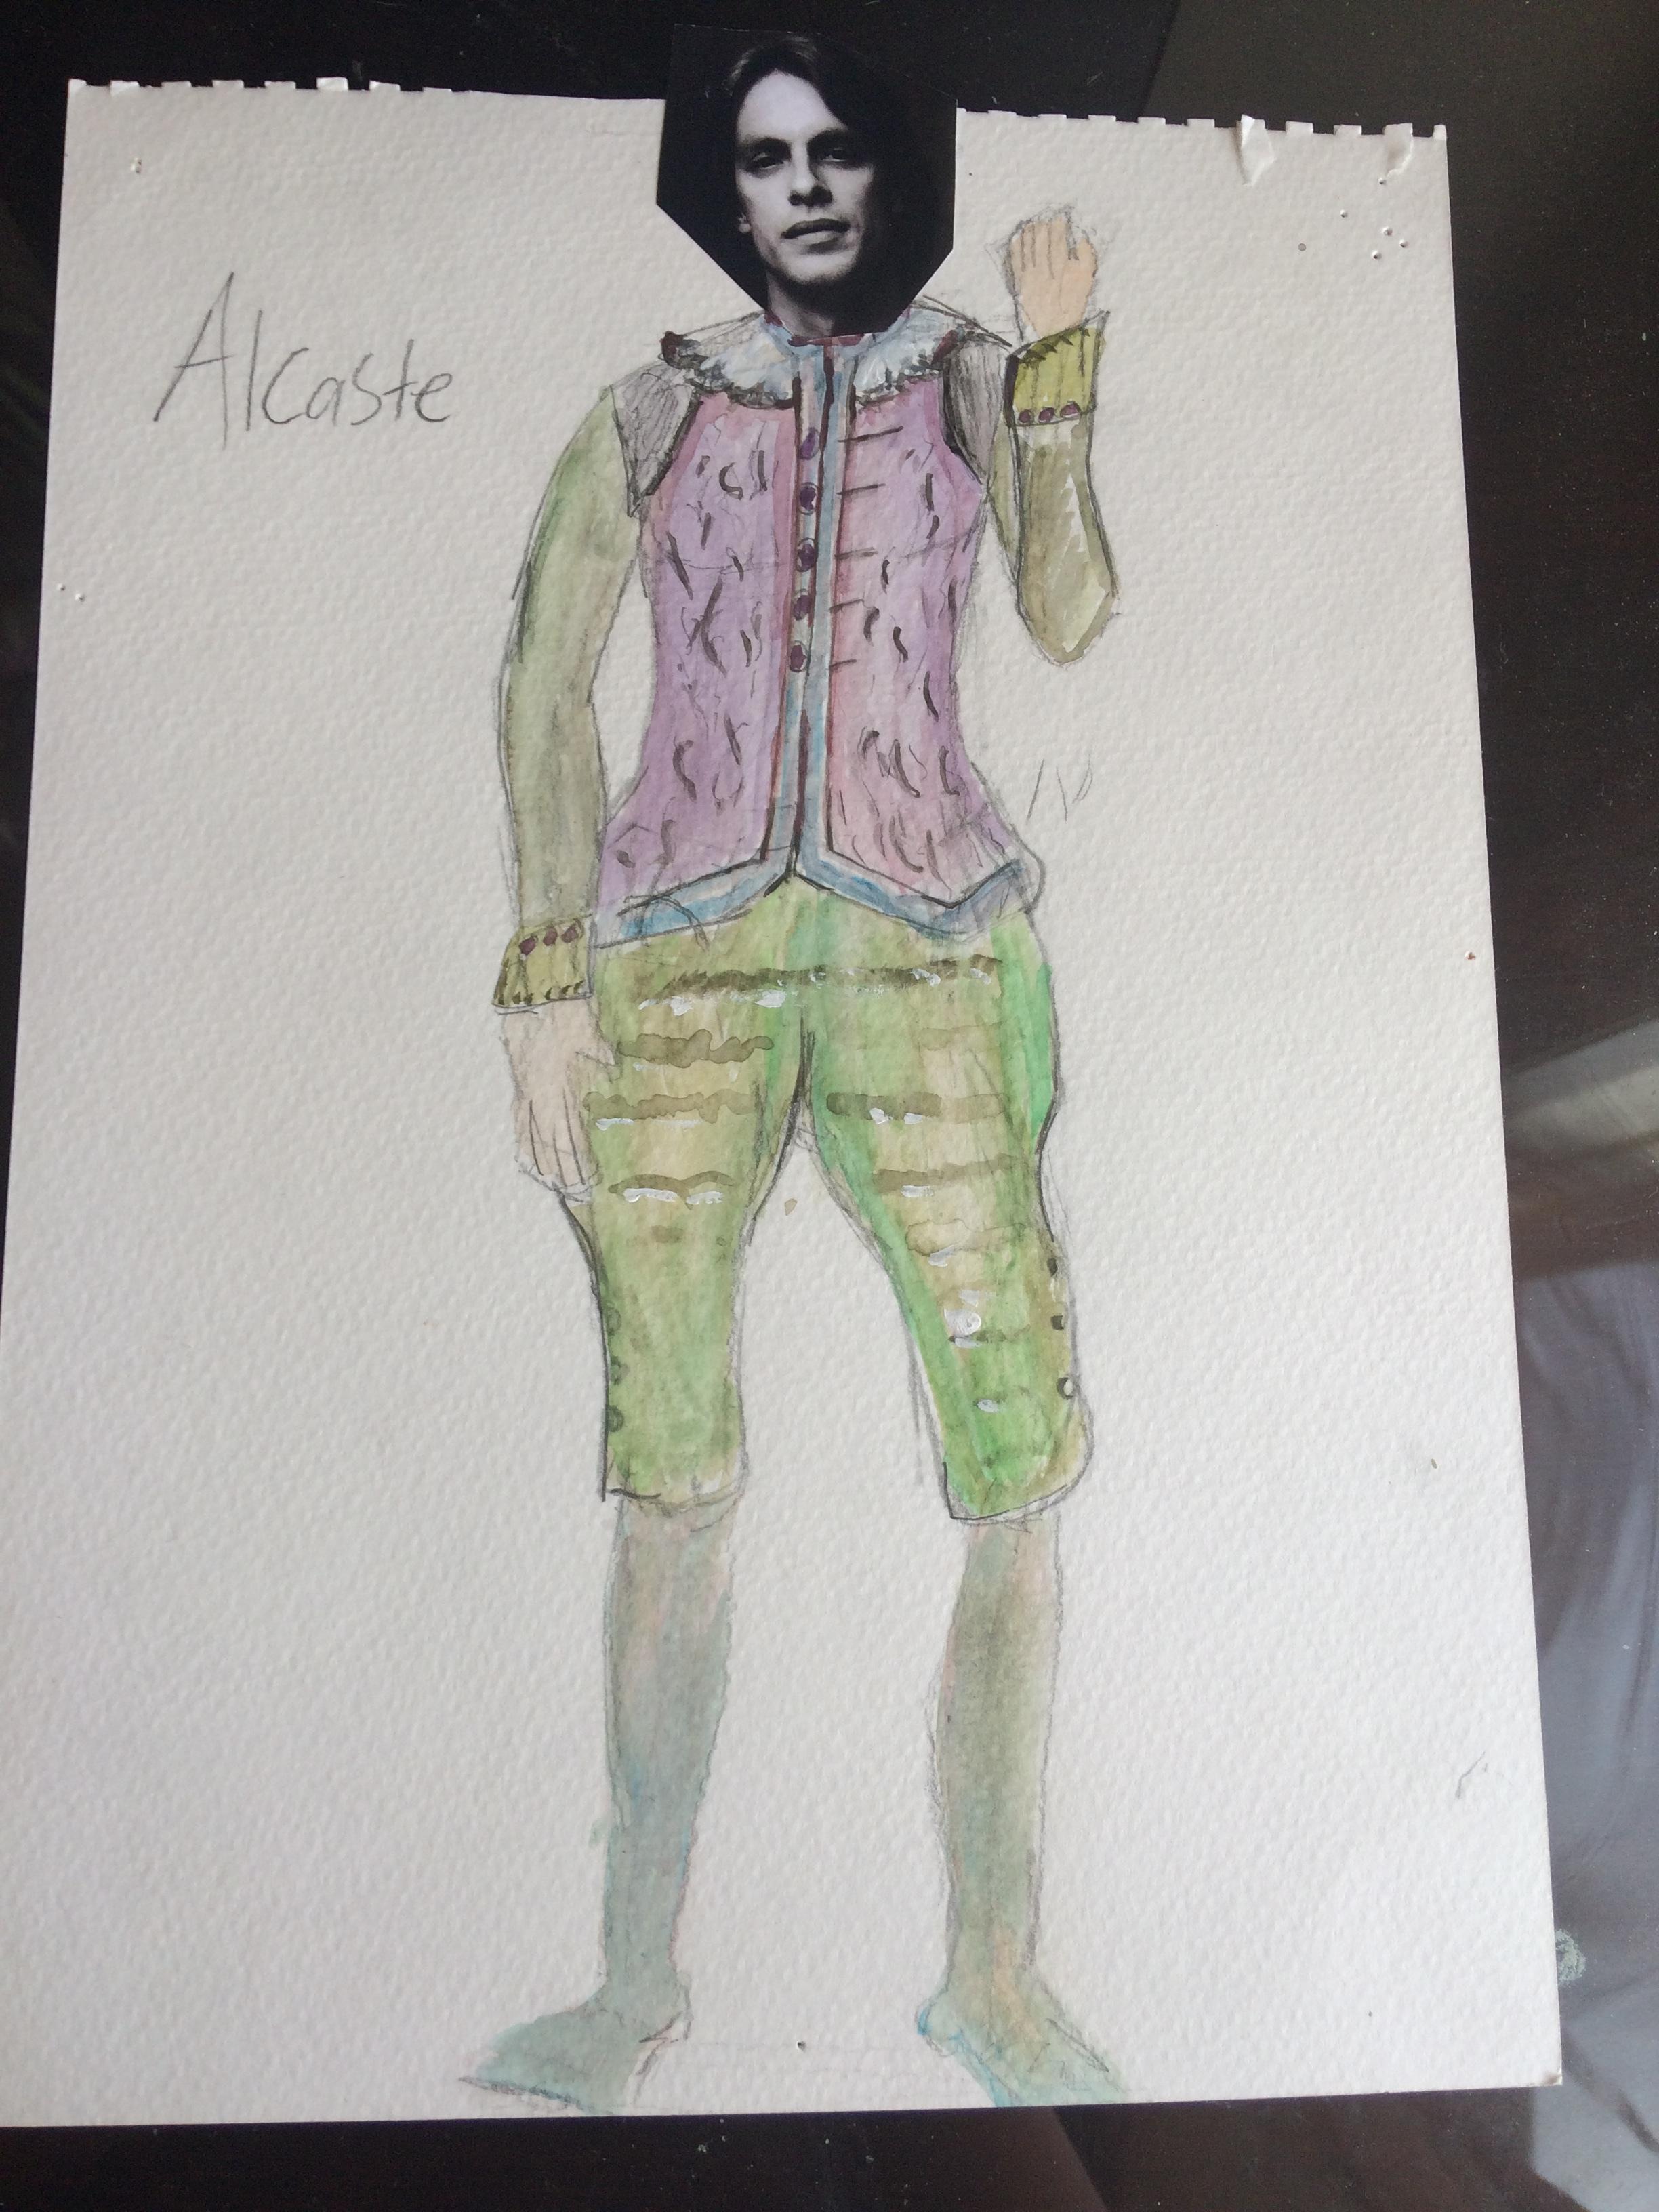 The Misanthrope- Alcaste